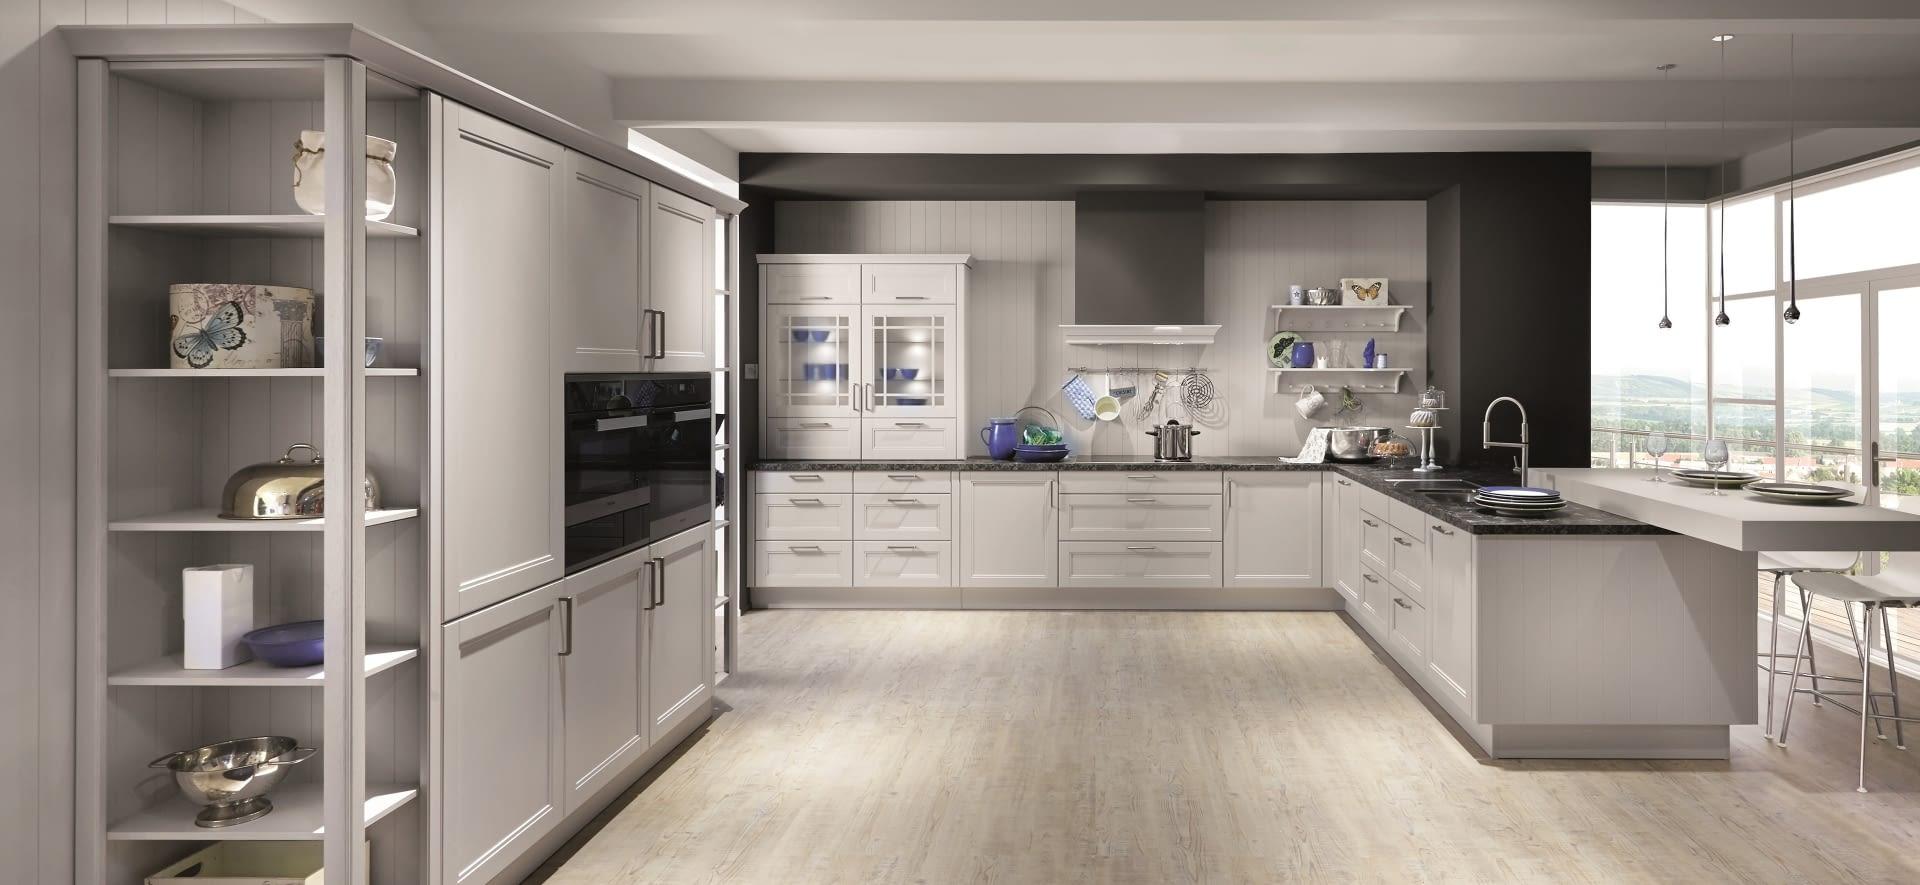 u k che landhaus york echtholz seidengrau mit steel grey. Black Bedroom Furniture Sets. Home Design Ideas